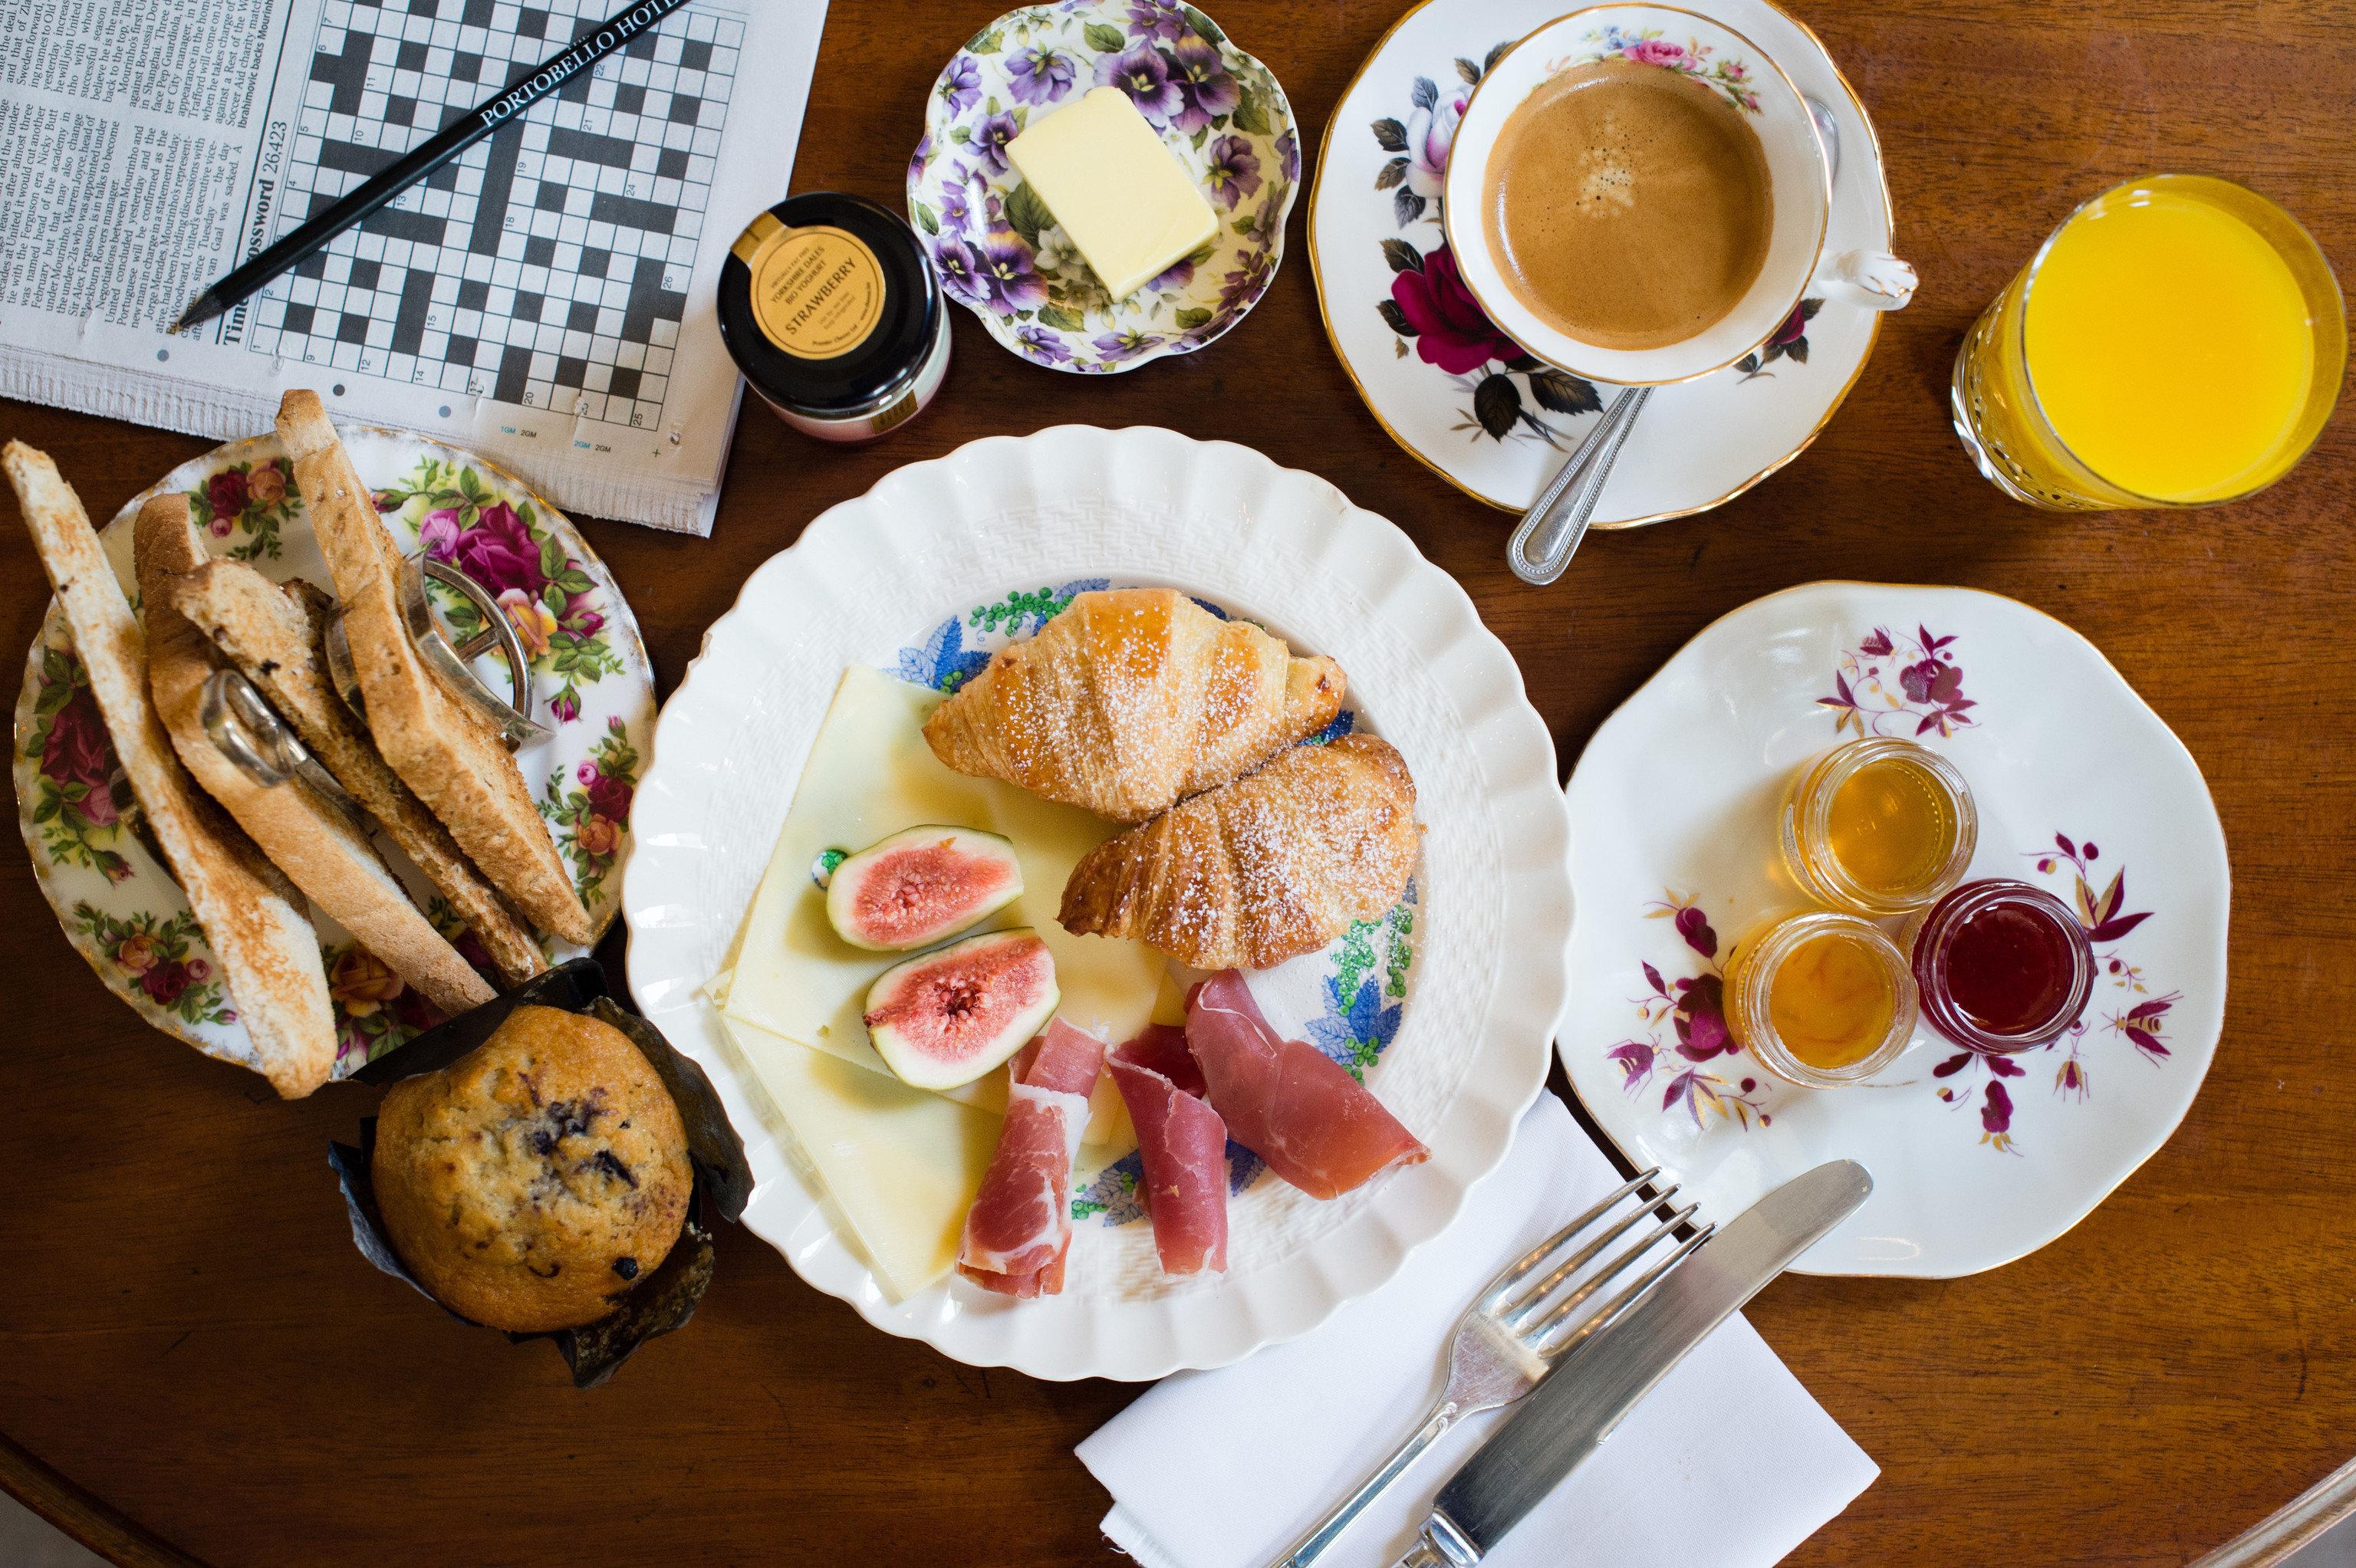 plate food cup breakfast lunch brunch hors d oeuvre baking supper cuisine Drink restaurant